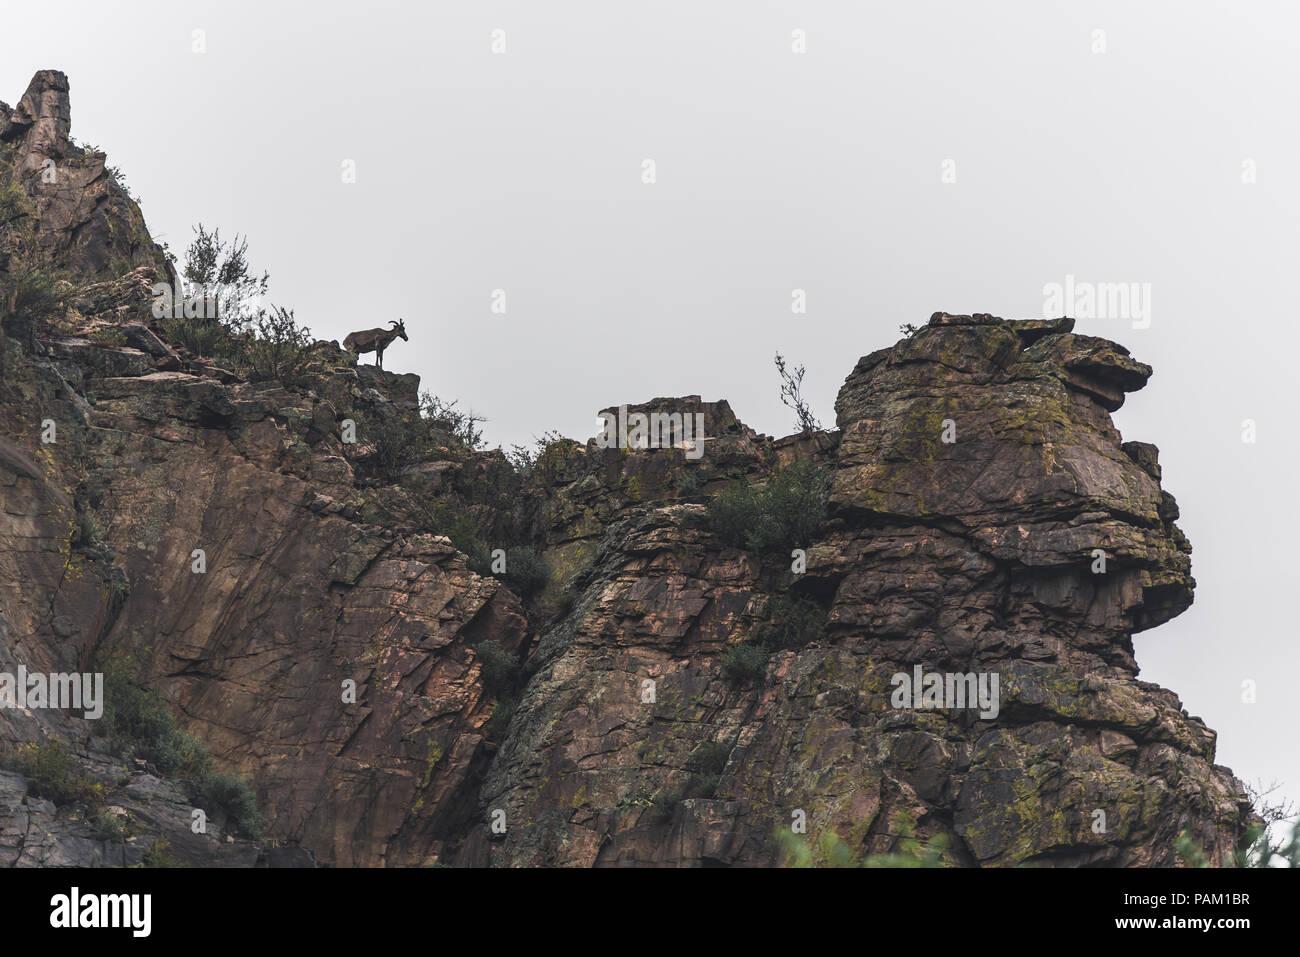 Colorado Mountains - Stock Image